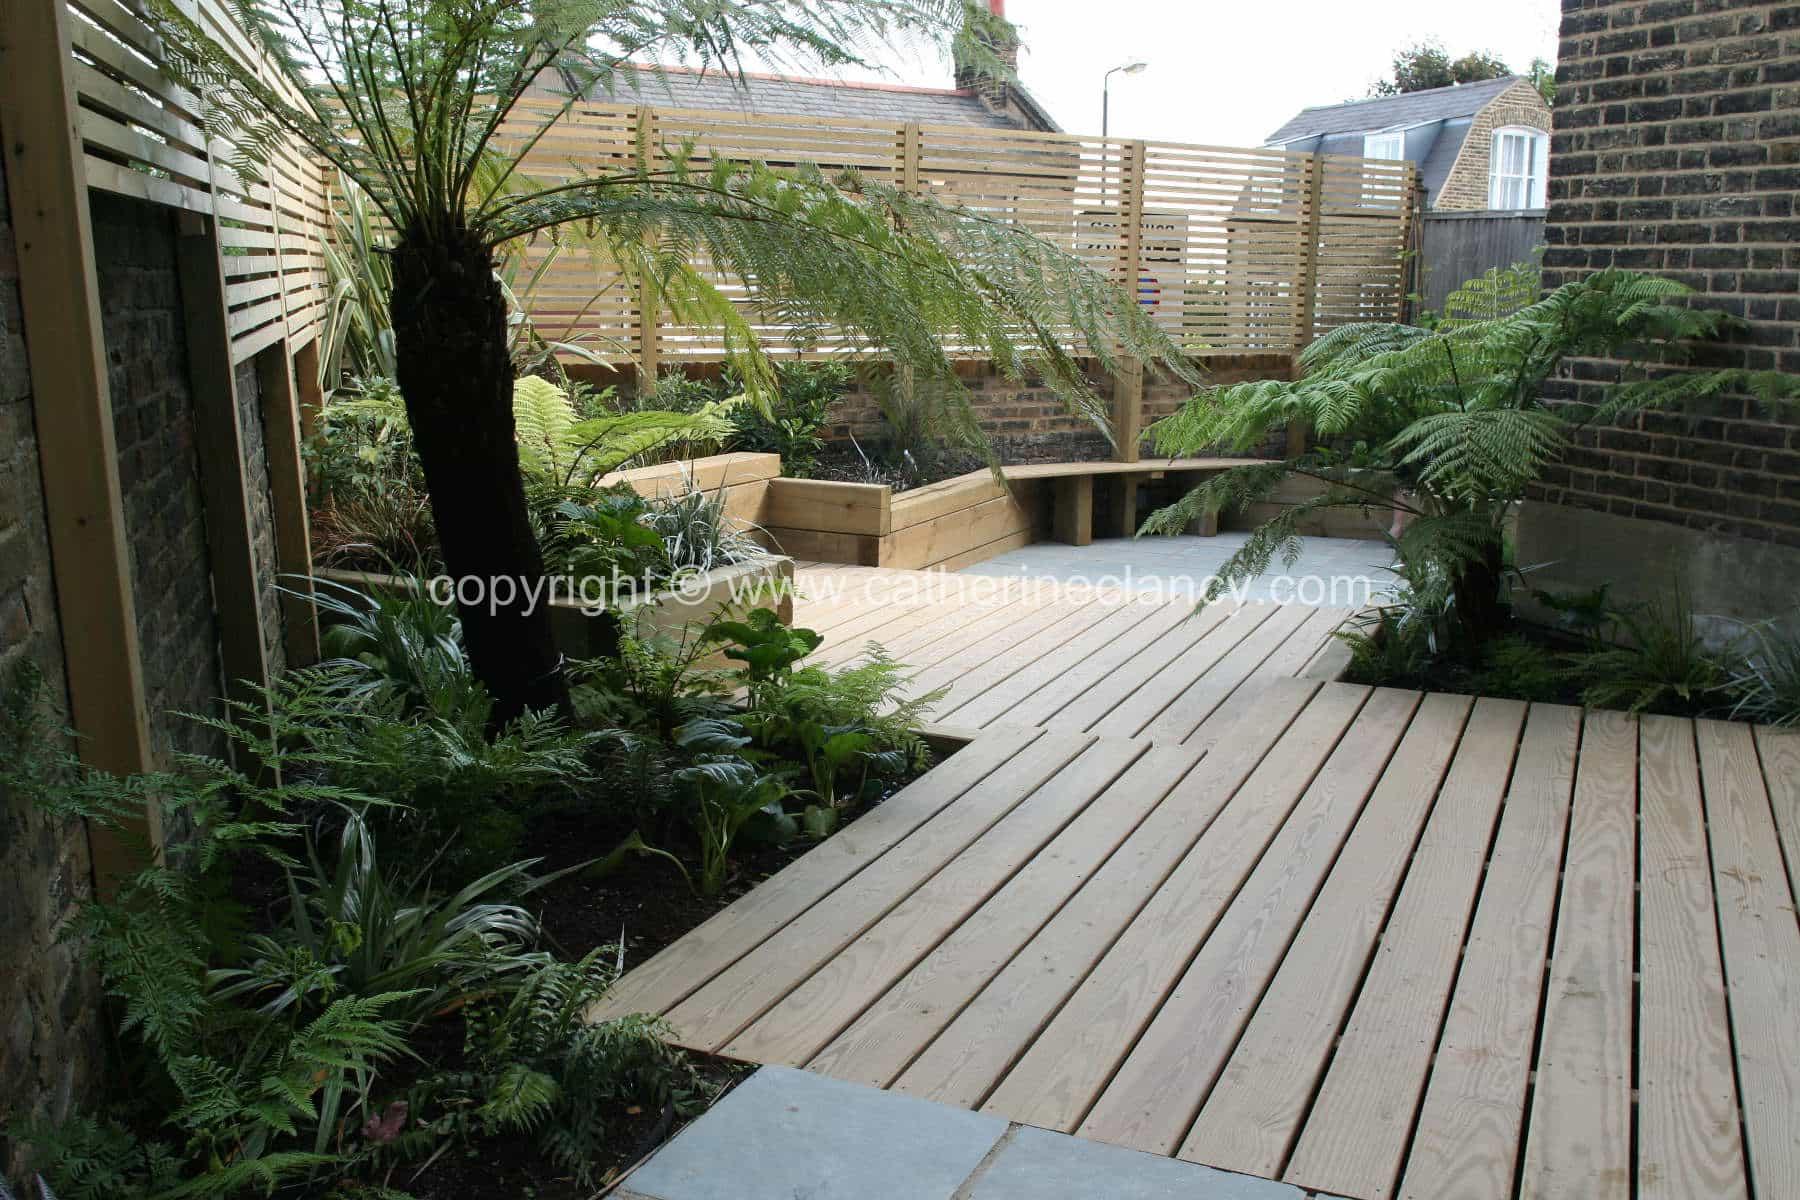 New zealand garden garden design london catherine clancy for Small garden designs nz